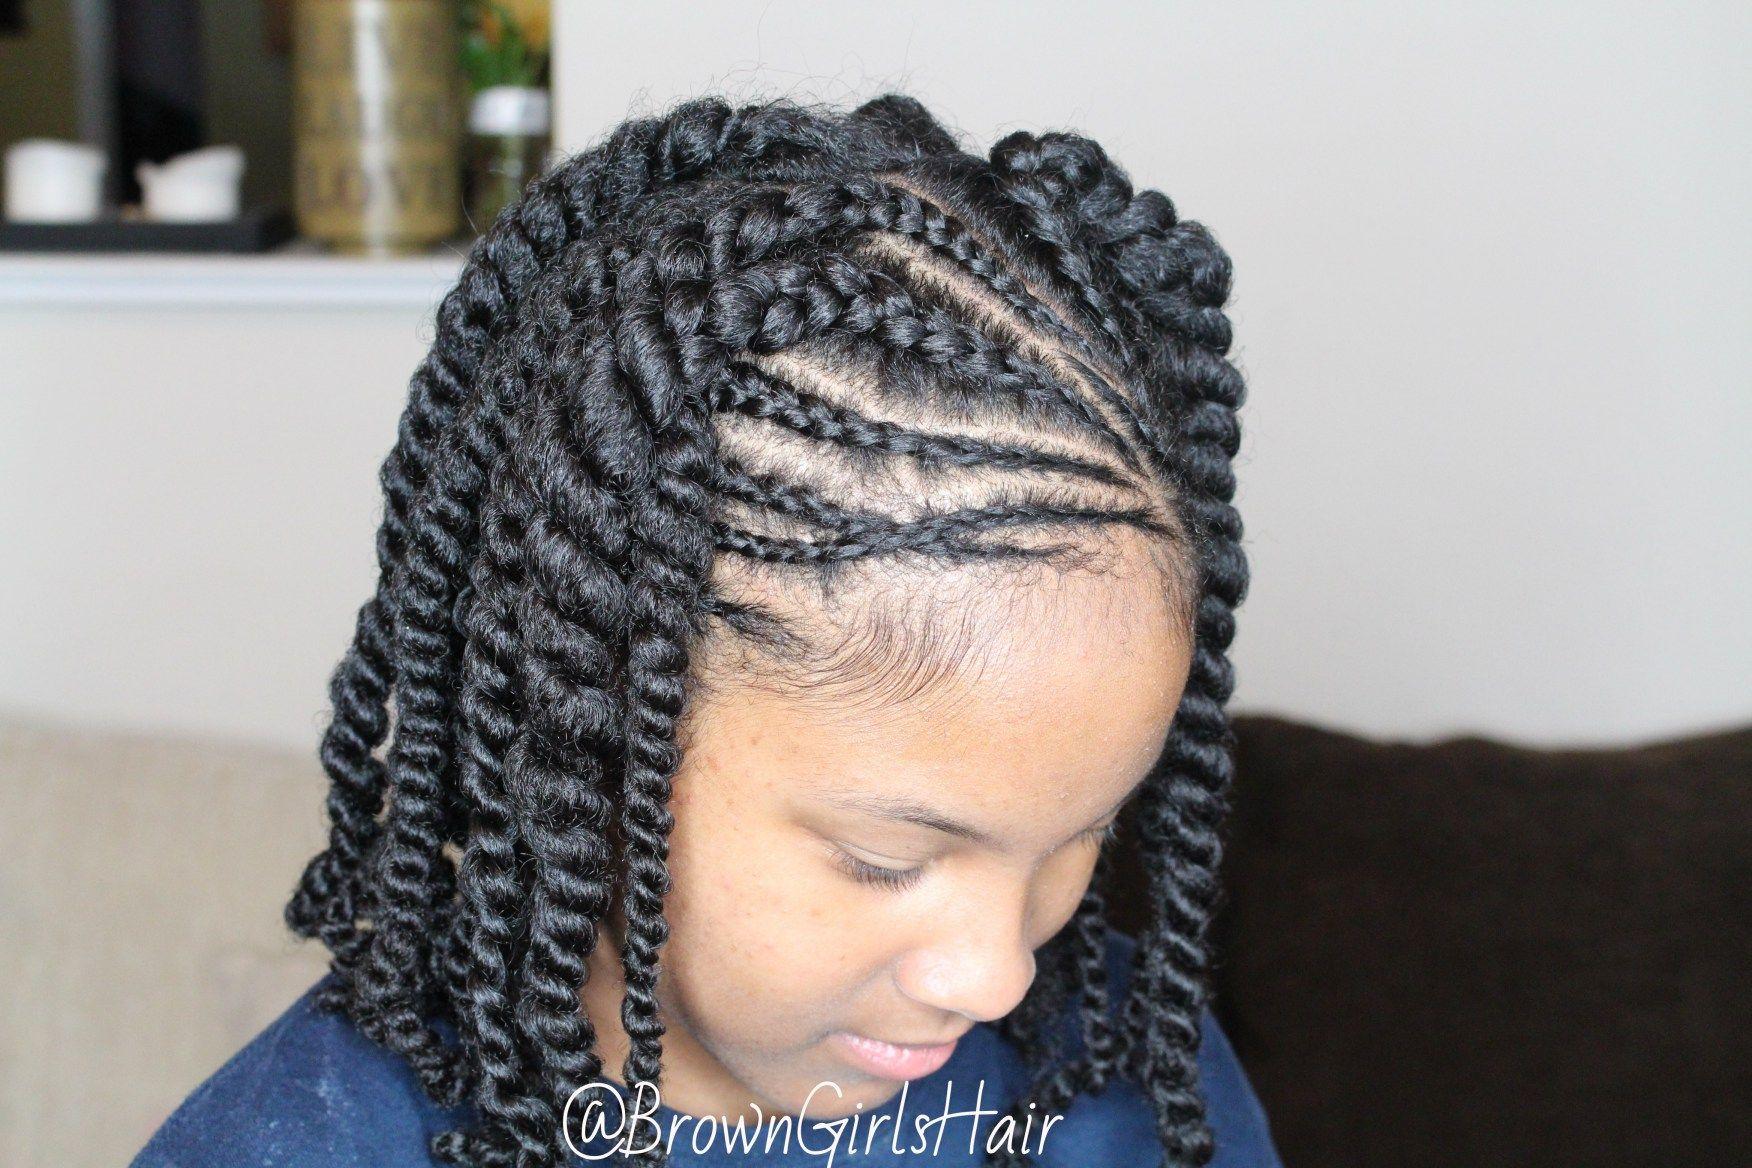 Natural Long Black Hair Care And Fashion Blog Kids Hairstyles